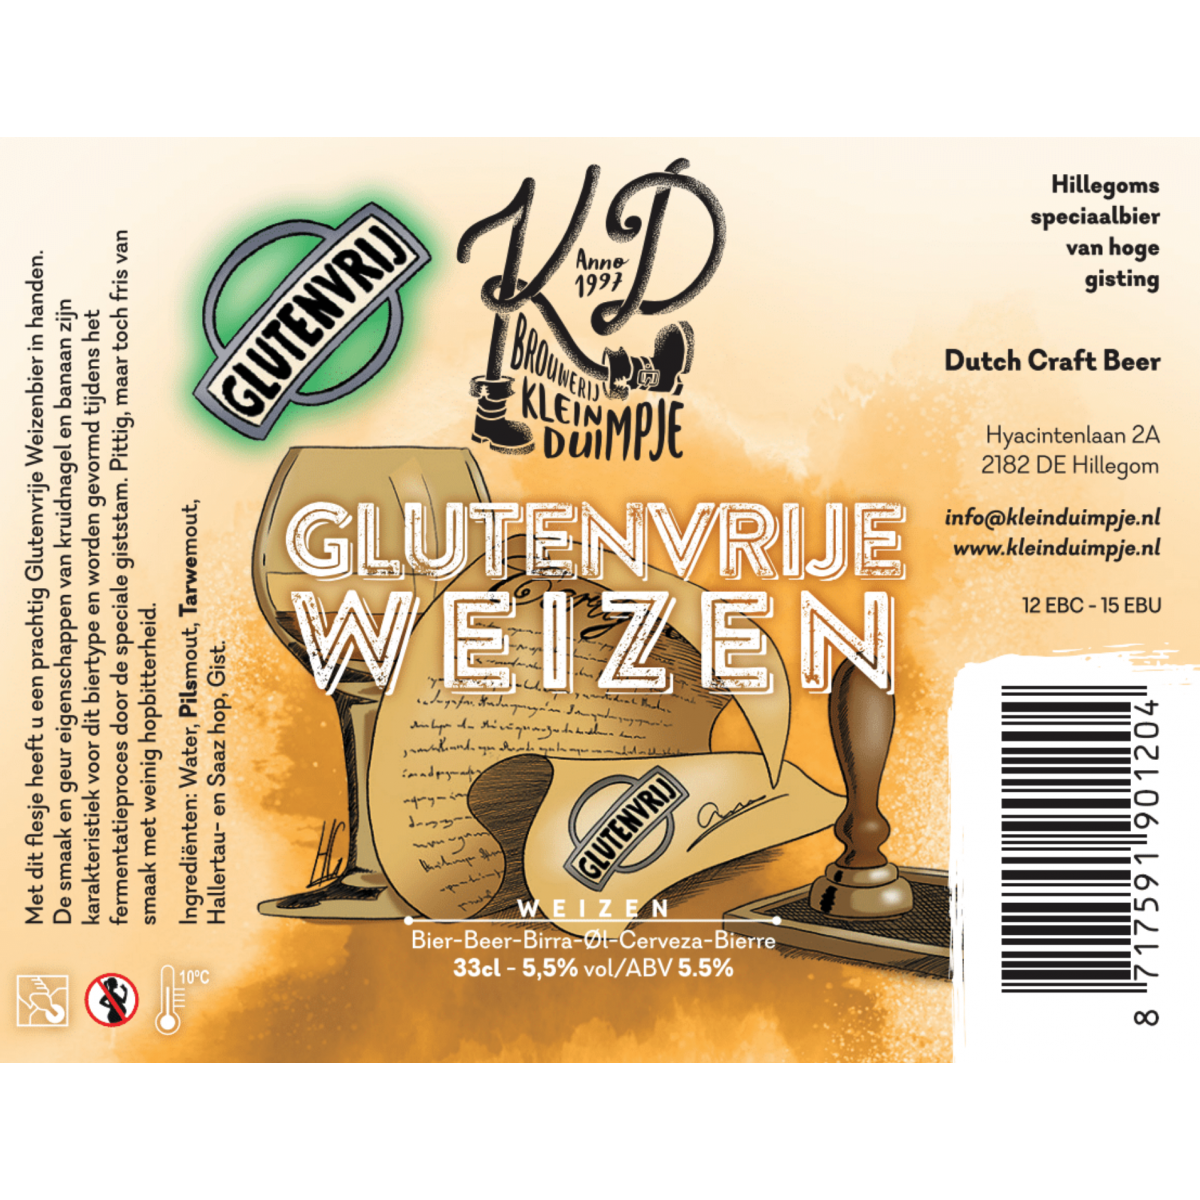 Glutenvrije Weizen